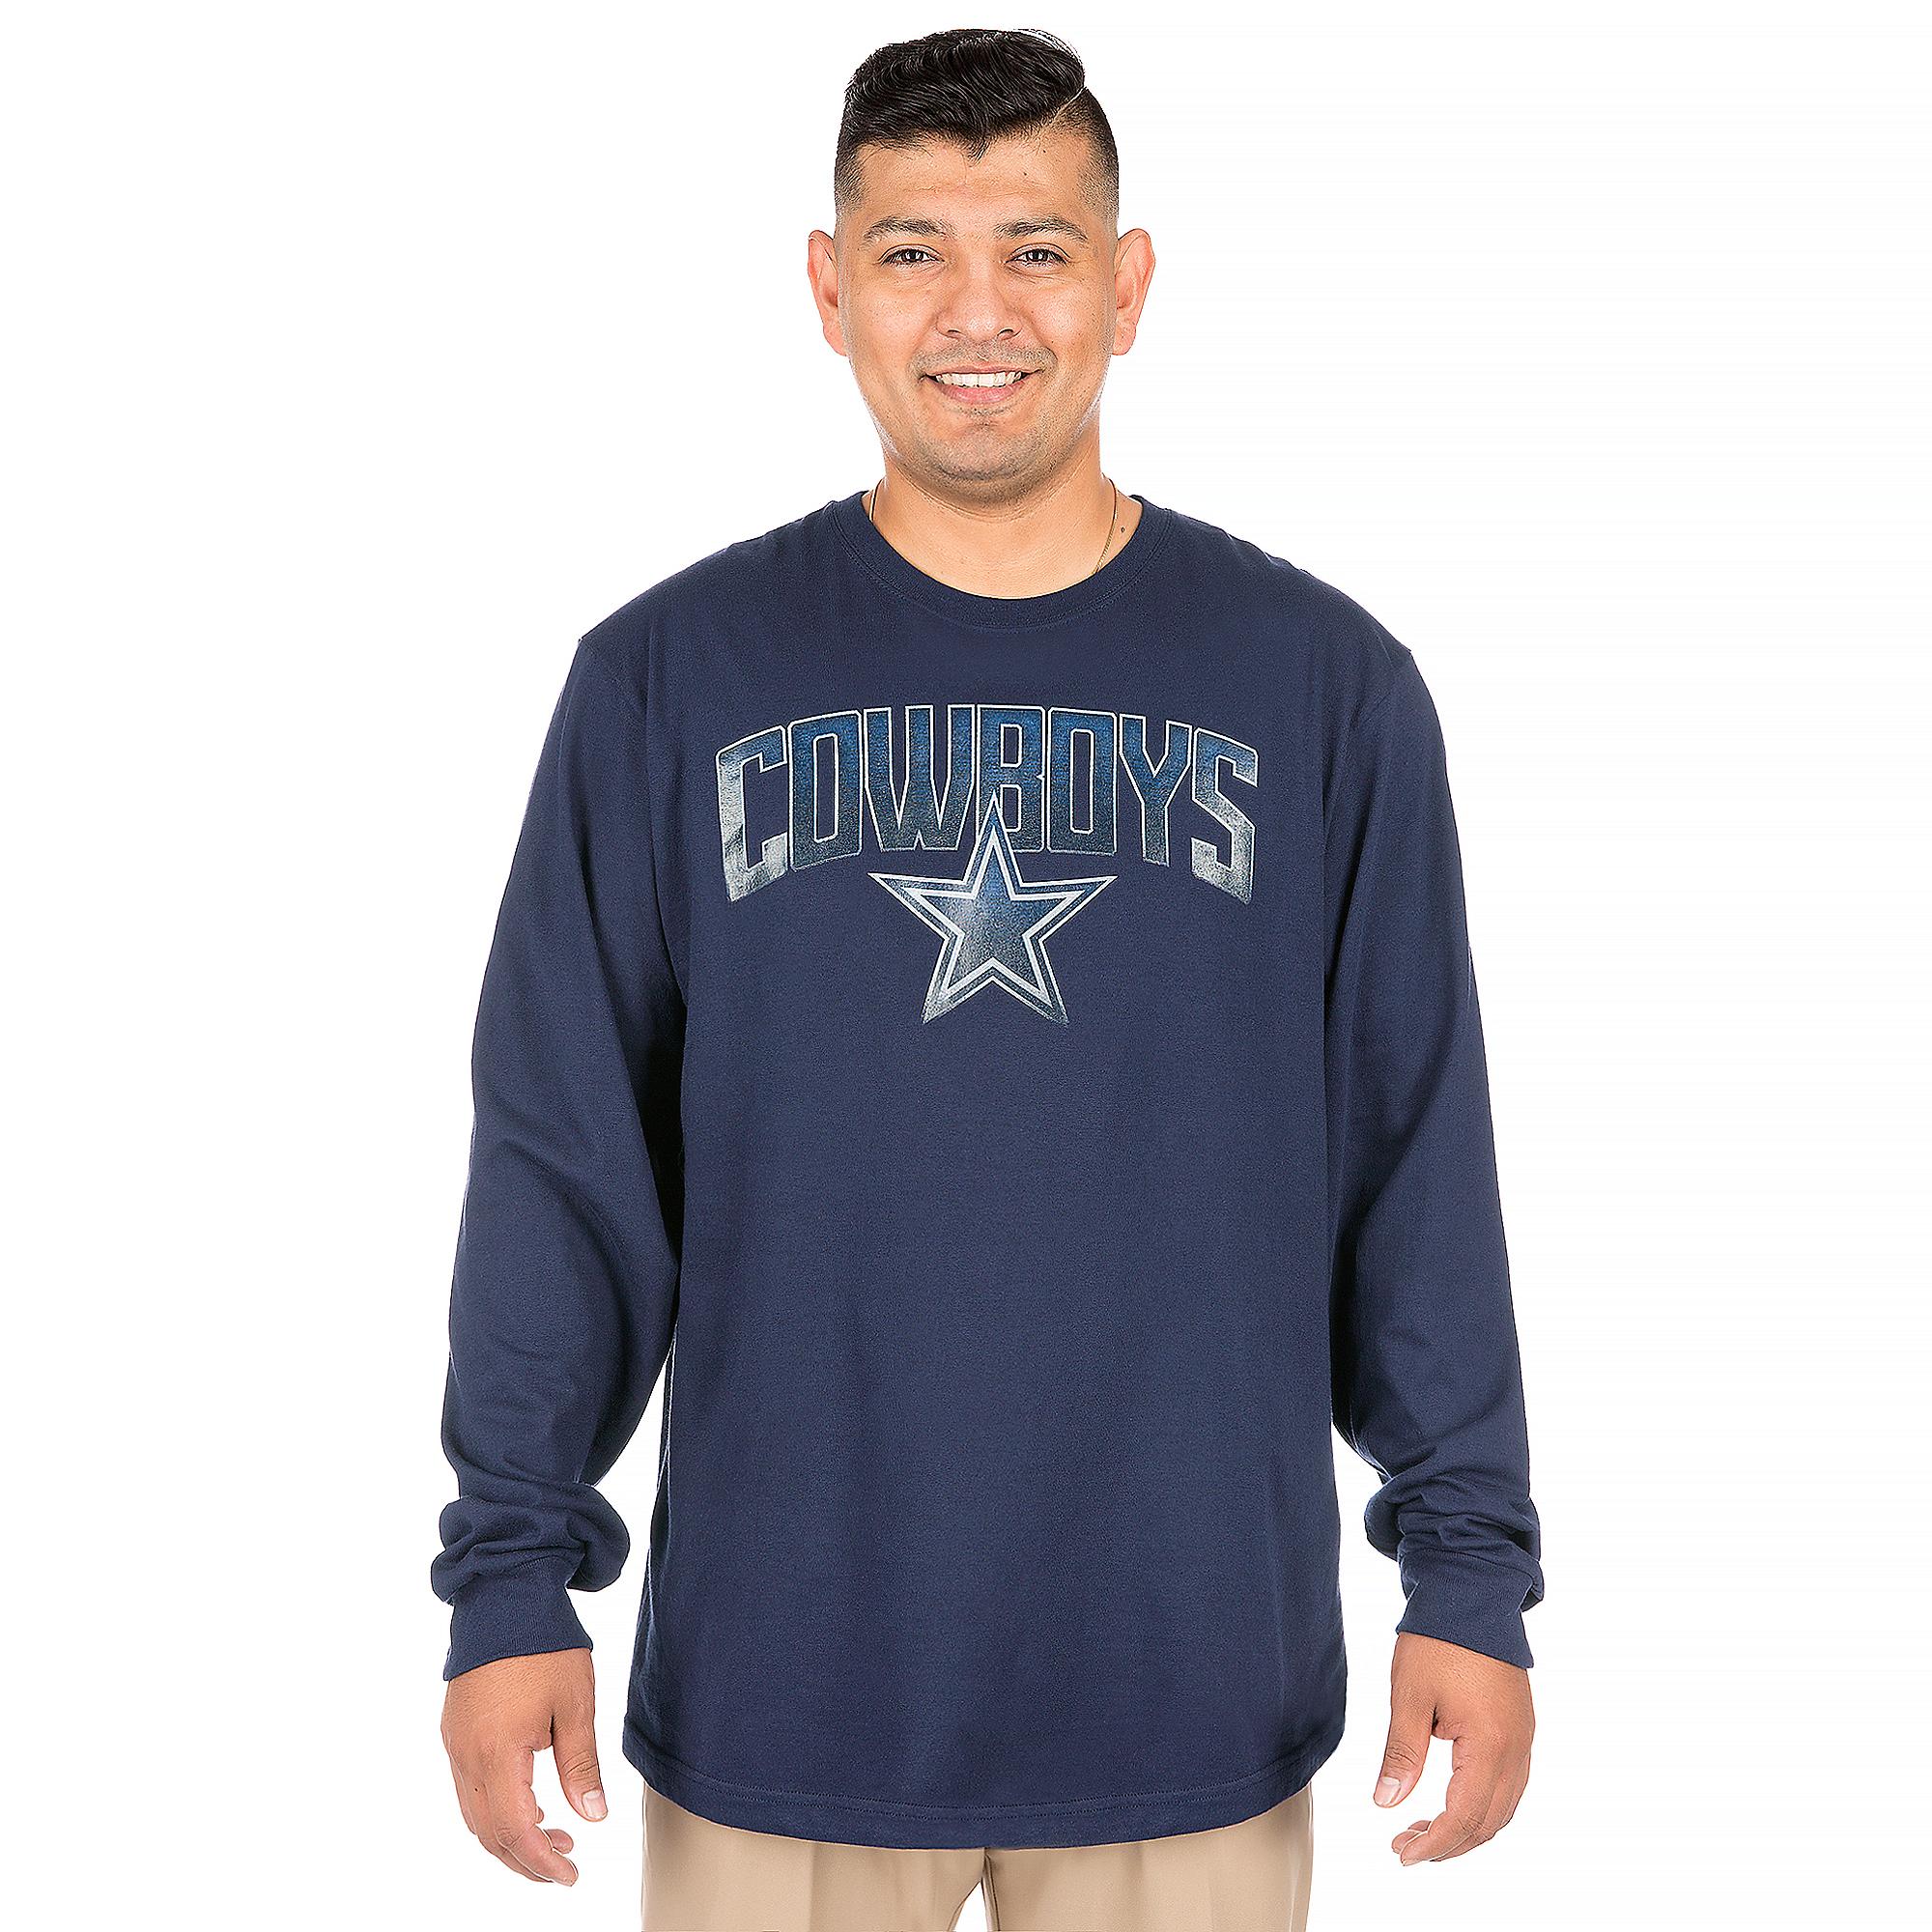 Dallas Cowboys Rescender Wave Long Sleeve Tee